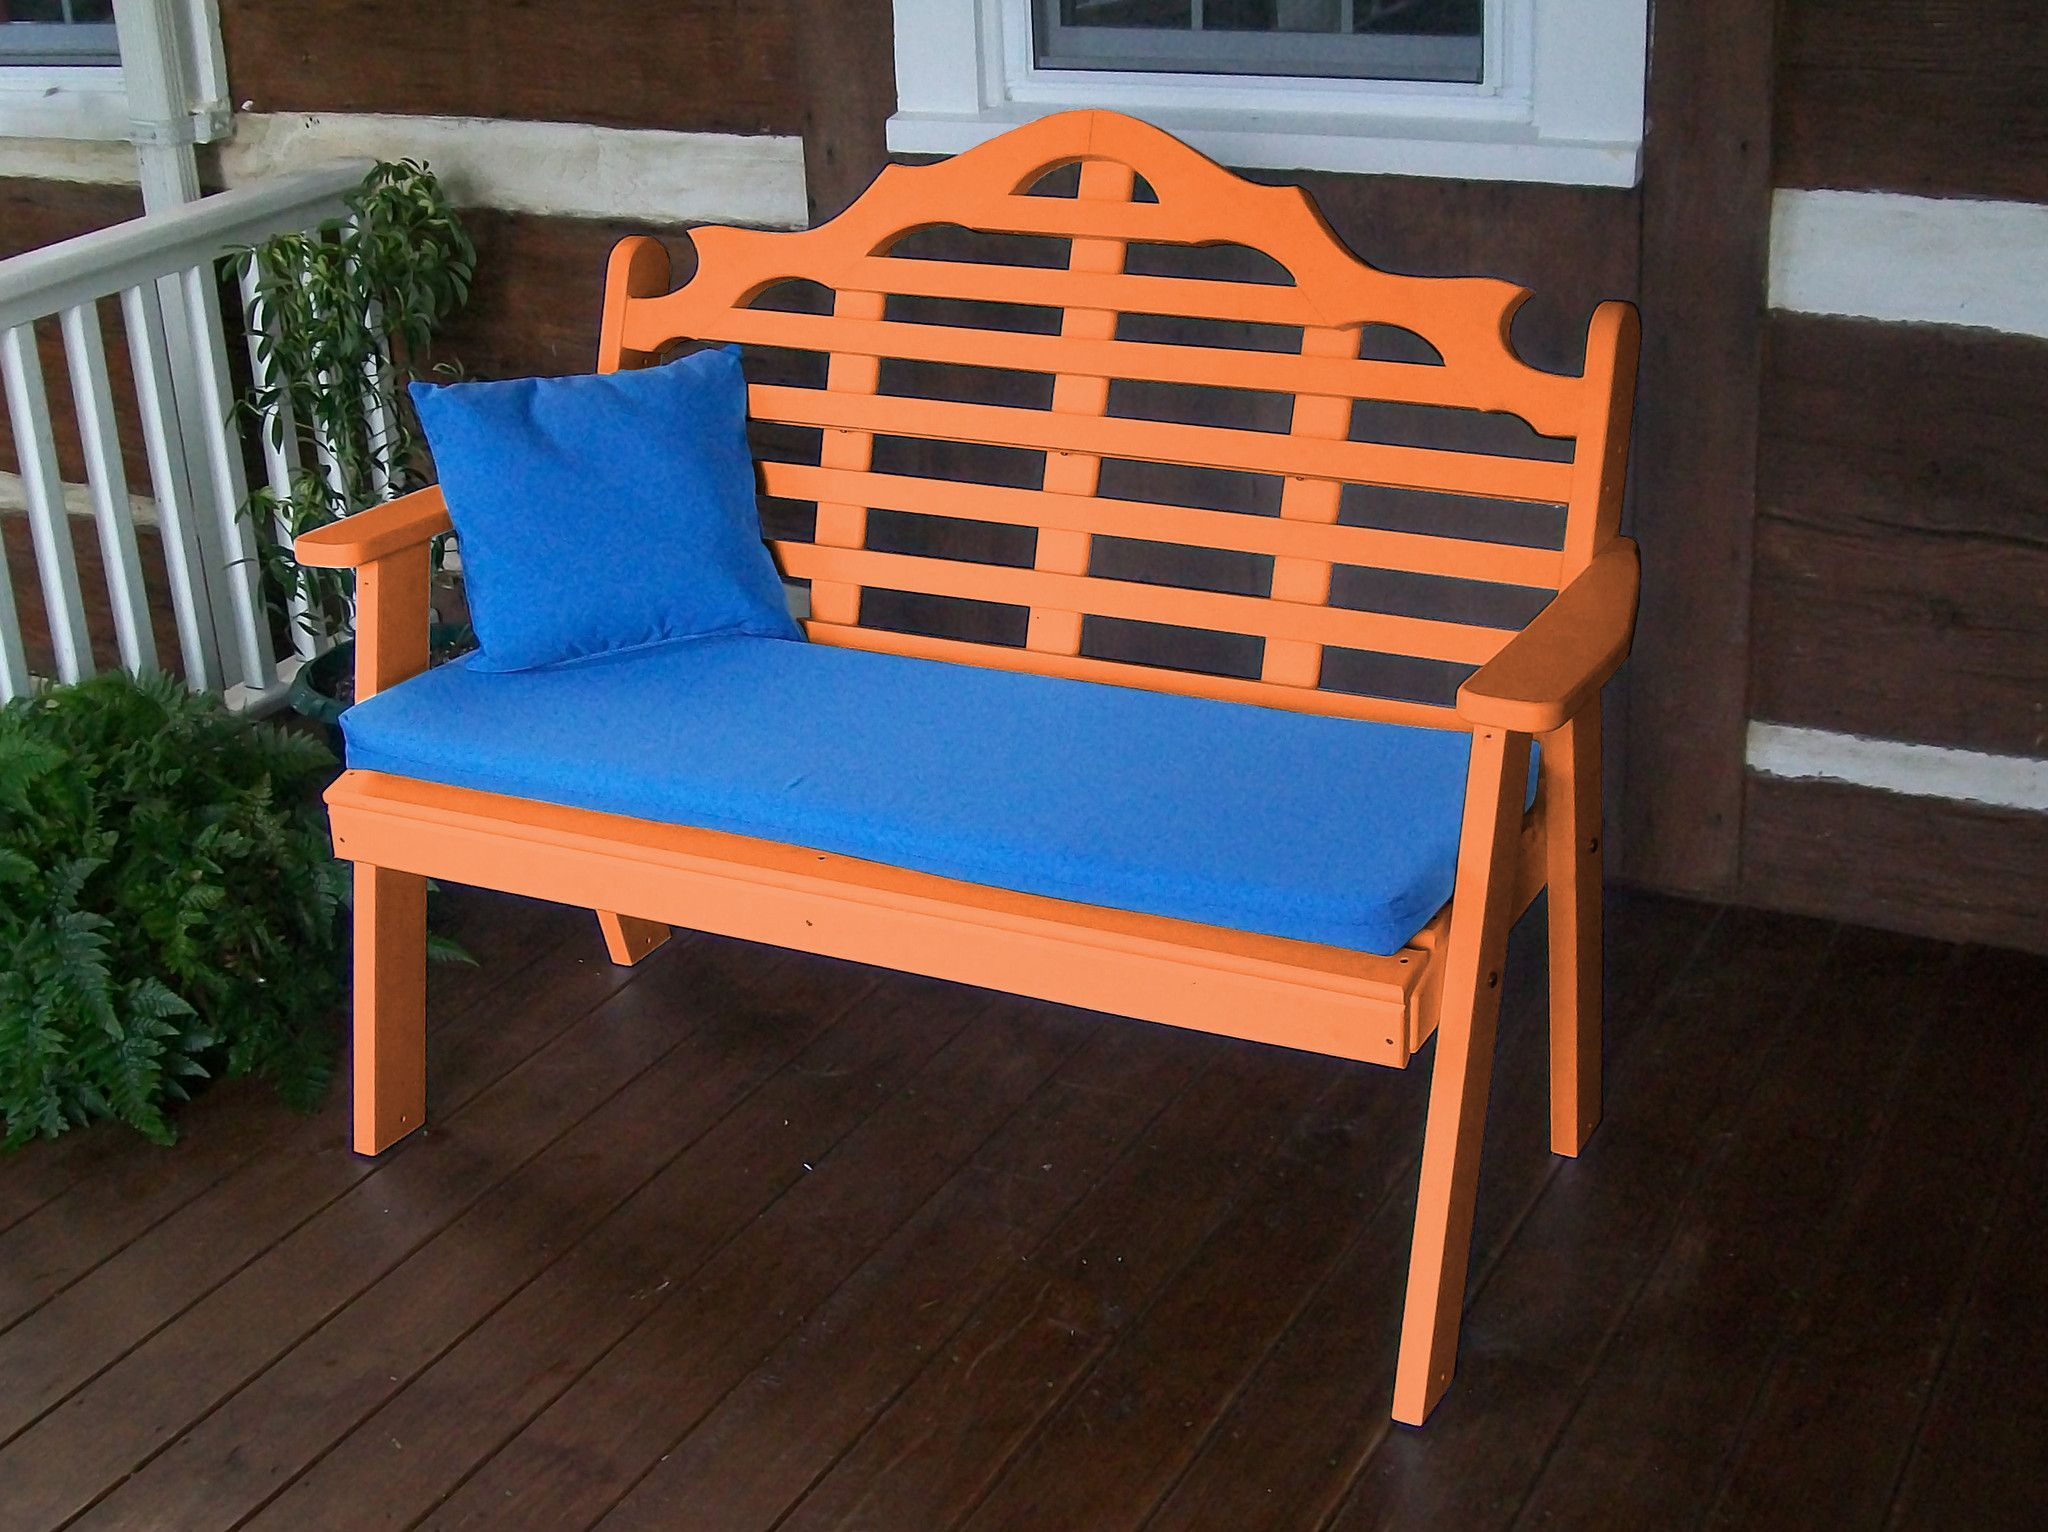 Au0026L Furniture Company Recycled Plastic 4u0027 Marlboro Garden Bench